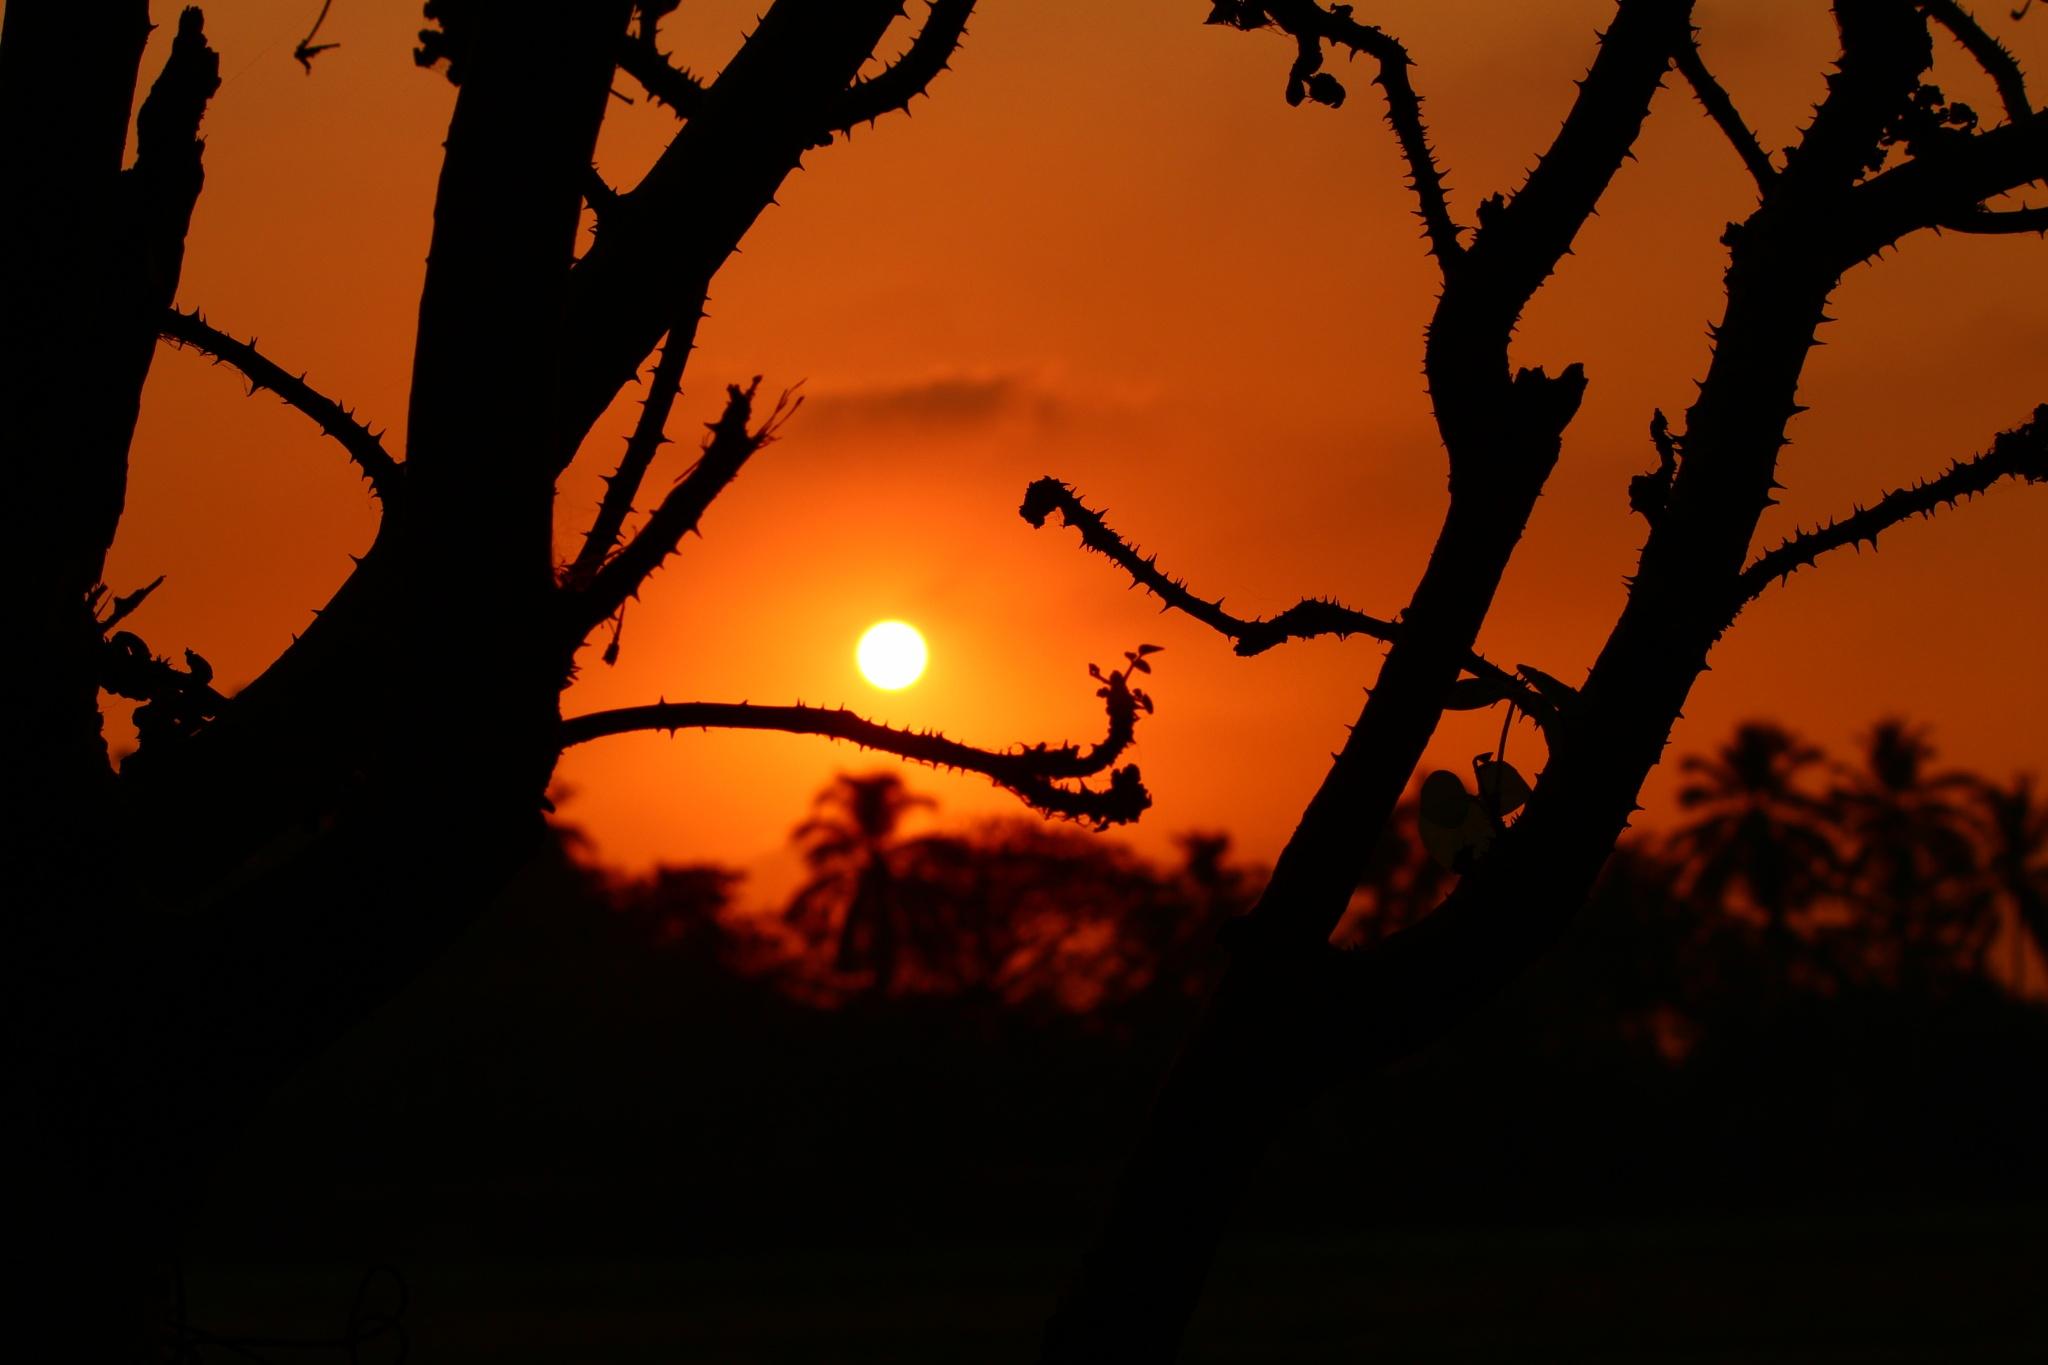 Pinball Sun by VeryOldSnake